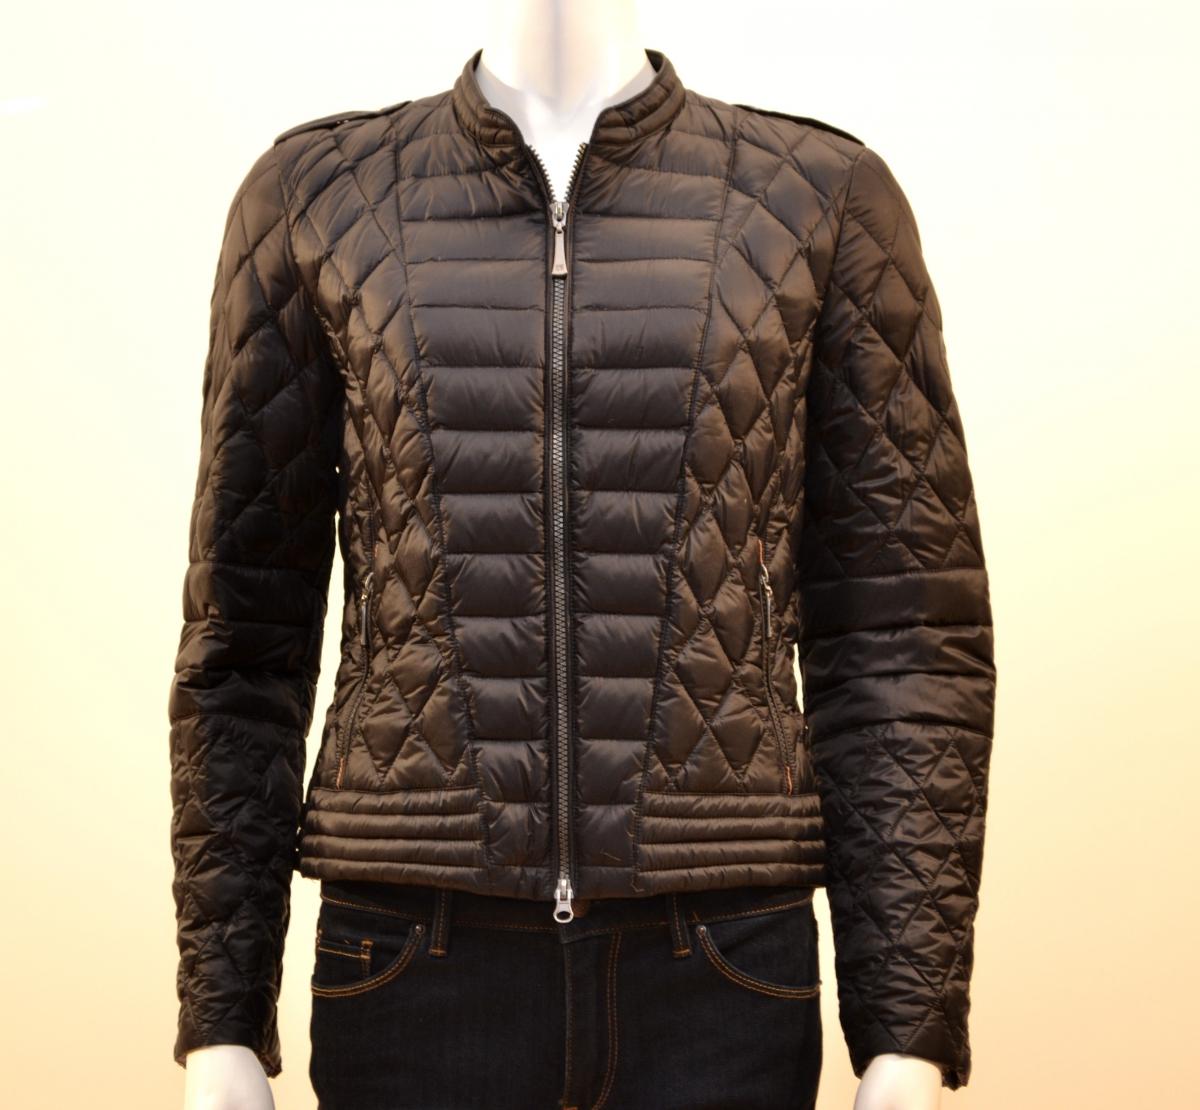 Barbara Black 50890018 Doudoune Lebek Vêtements De Sv4dqx7wx